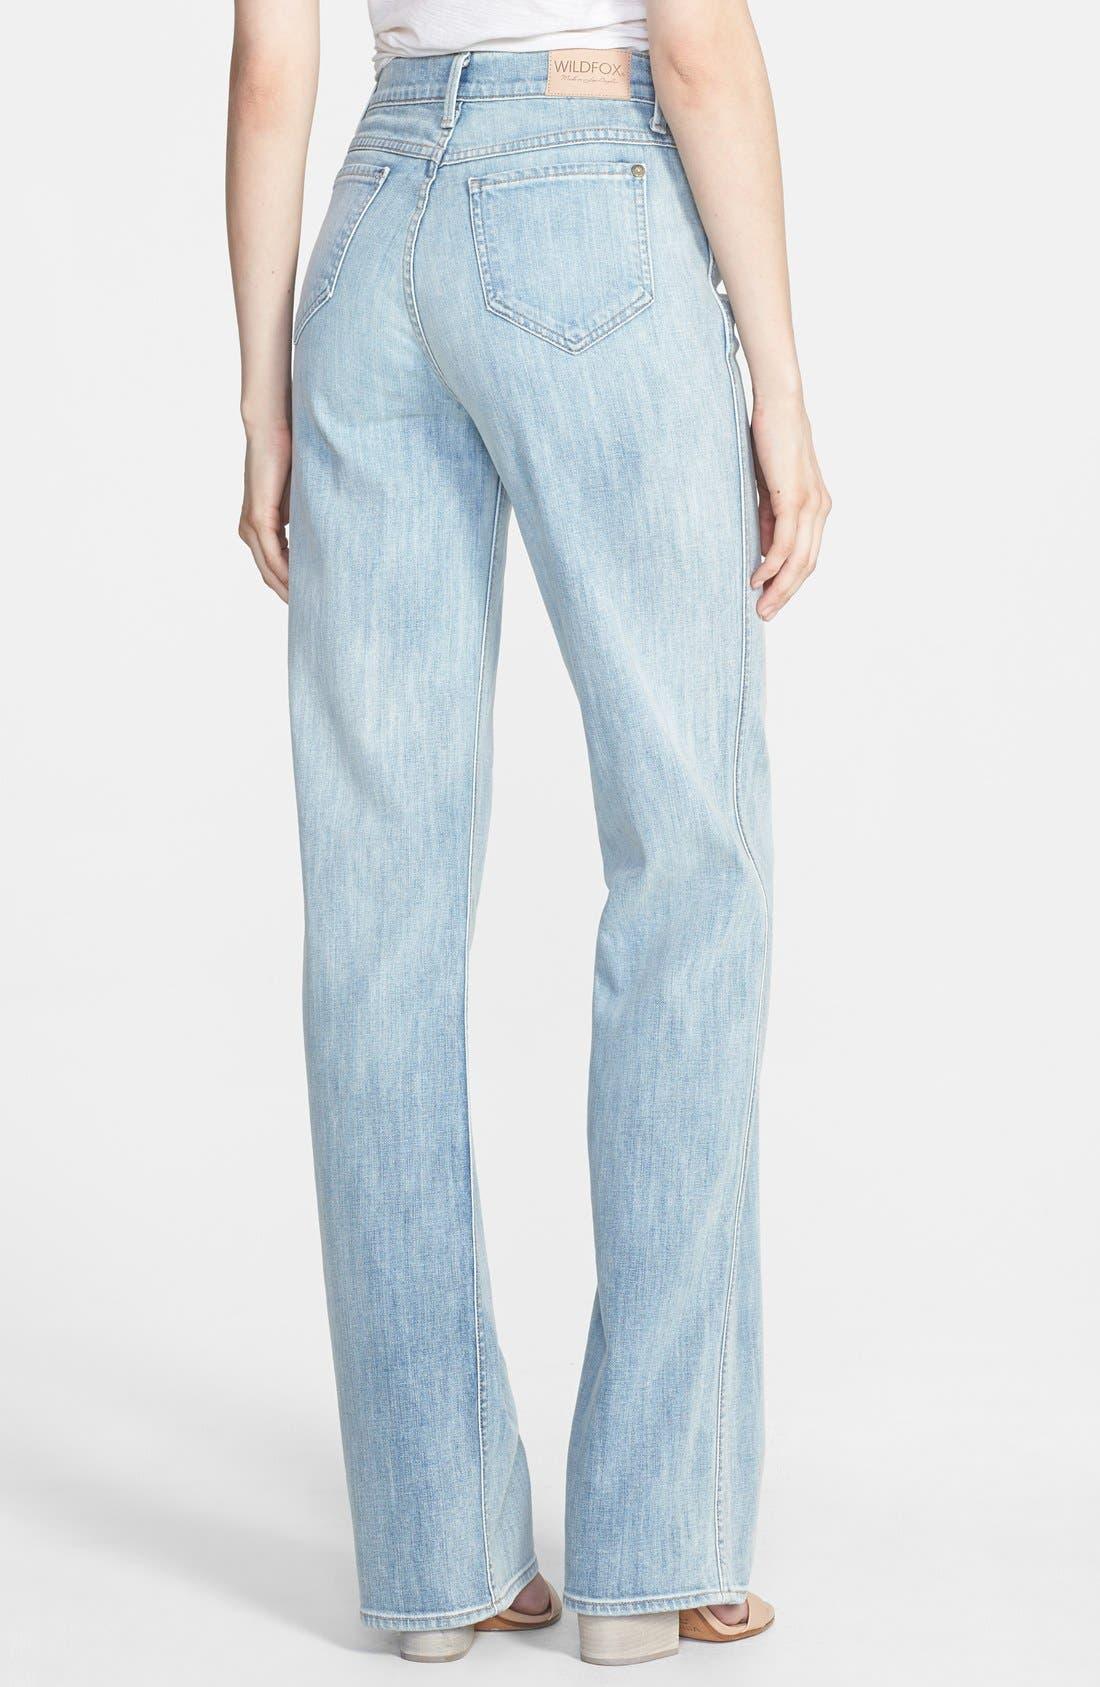 Alternate Image 2  - Wildfox 'Luca' High Rise Straight Leg Jeans (Faithful)